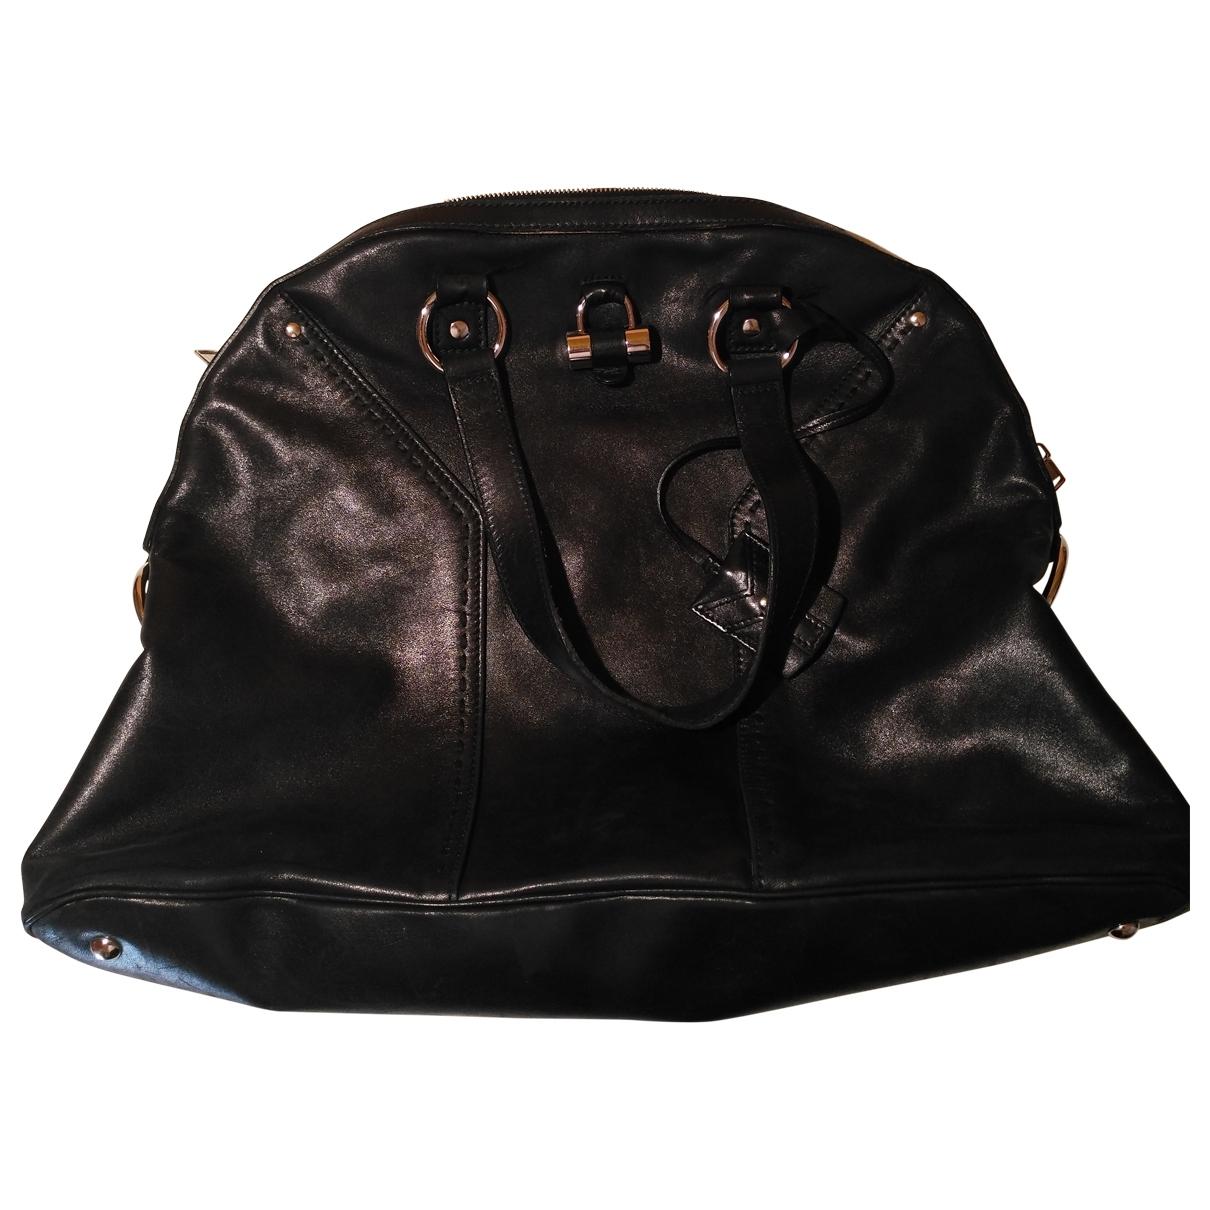 Yves Saint Laurent Muse Handtasche in  Schwarz Leder